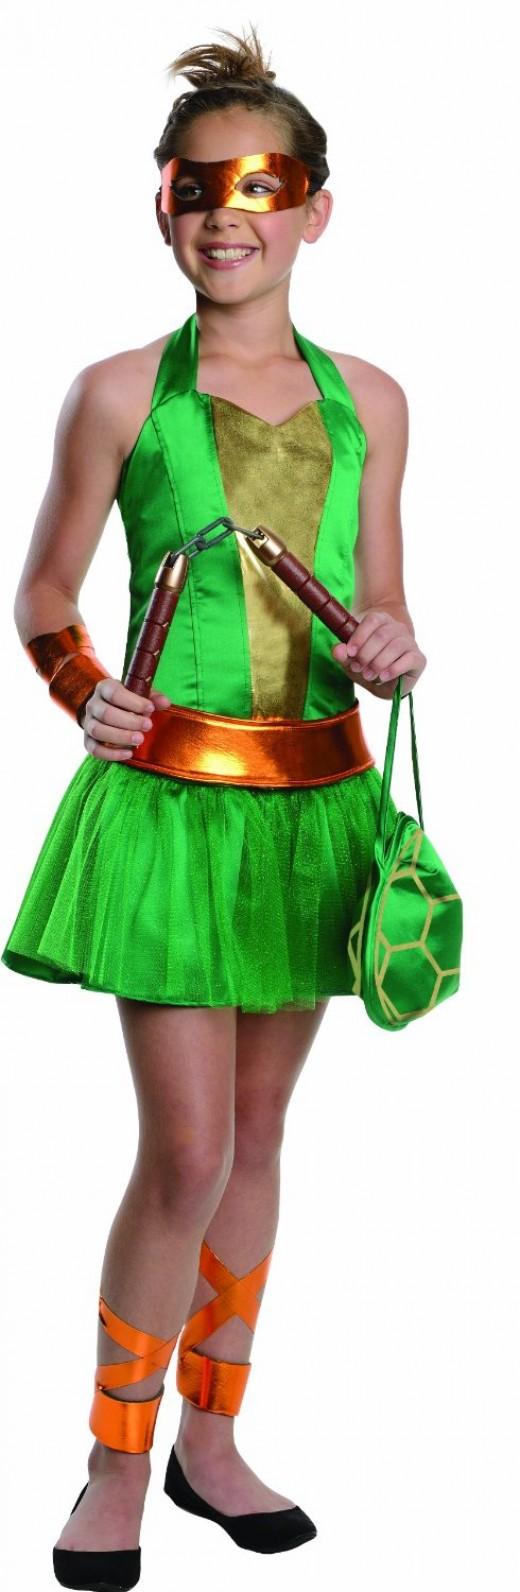 Teenage mutant ninja turtles costume for teen girls - photo#3